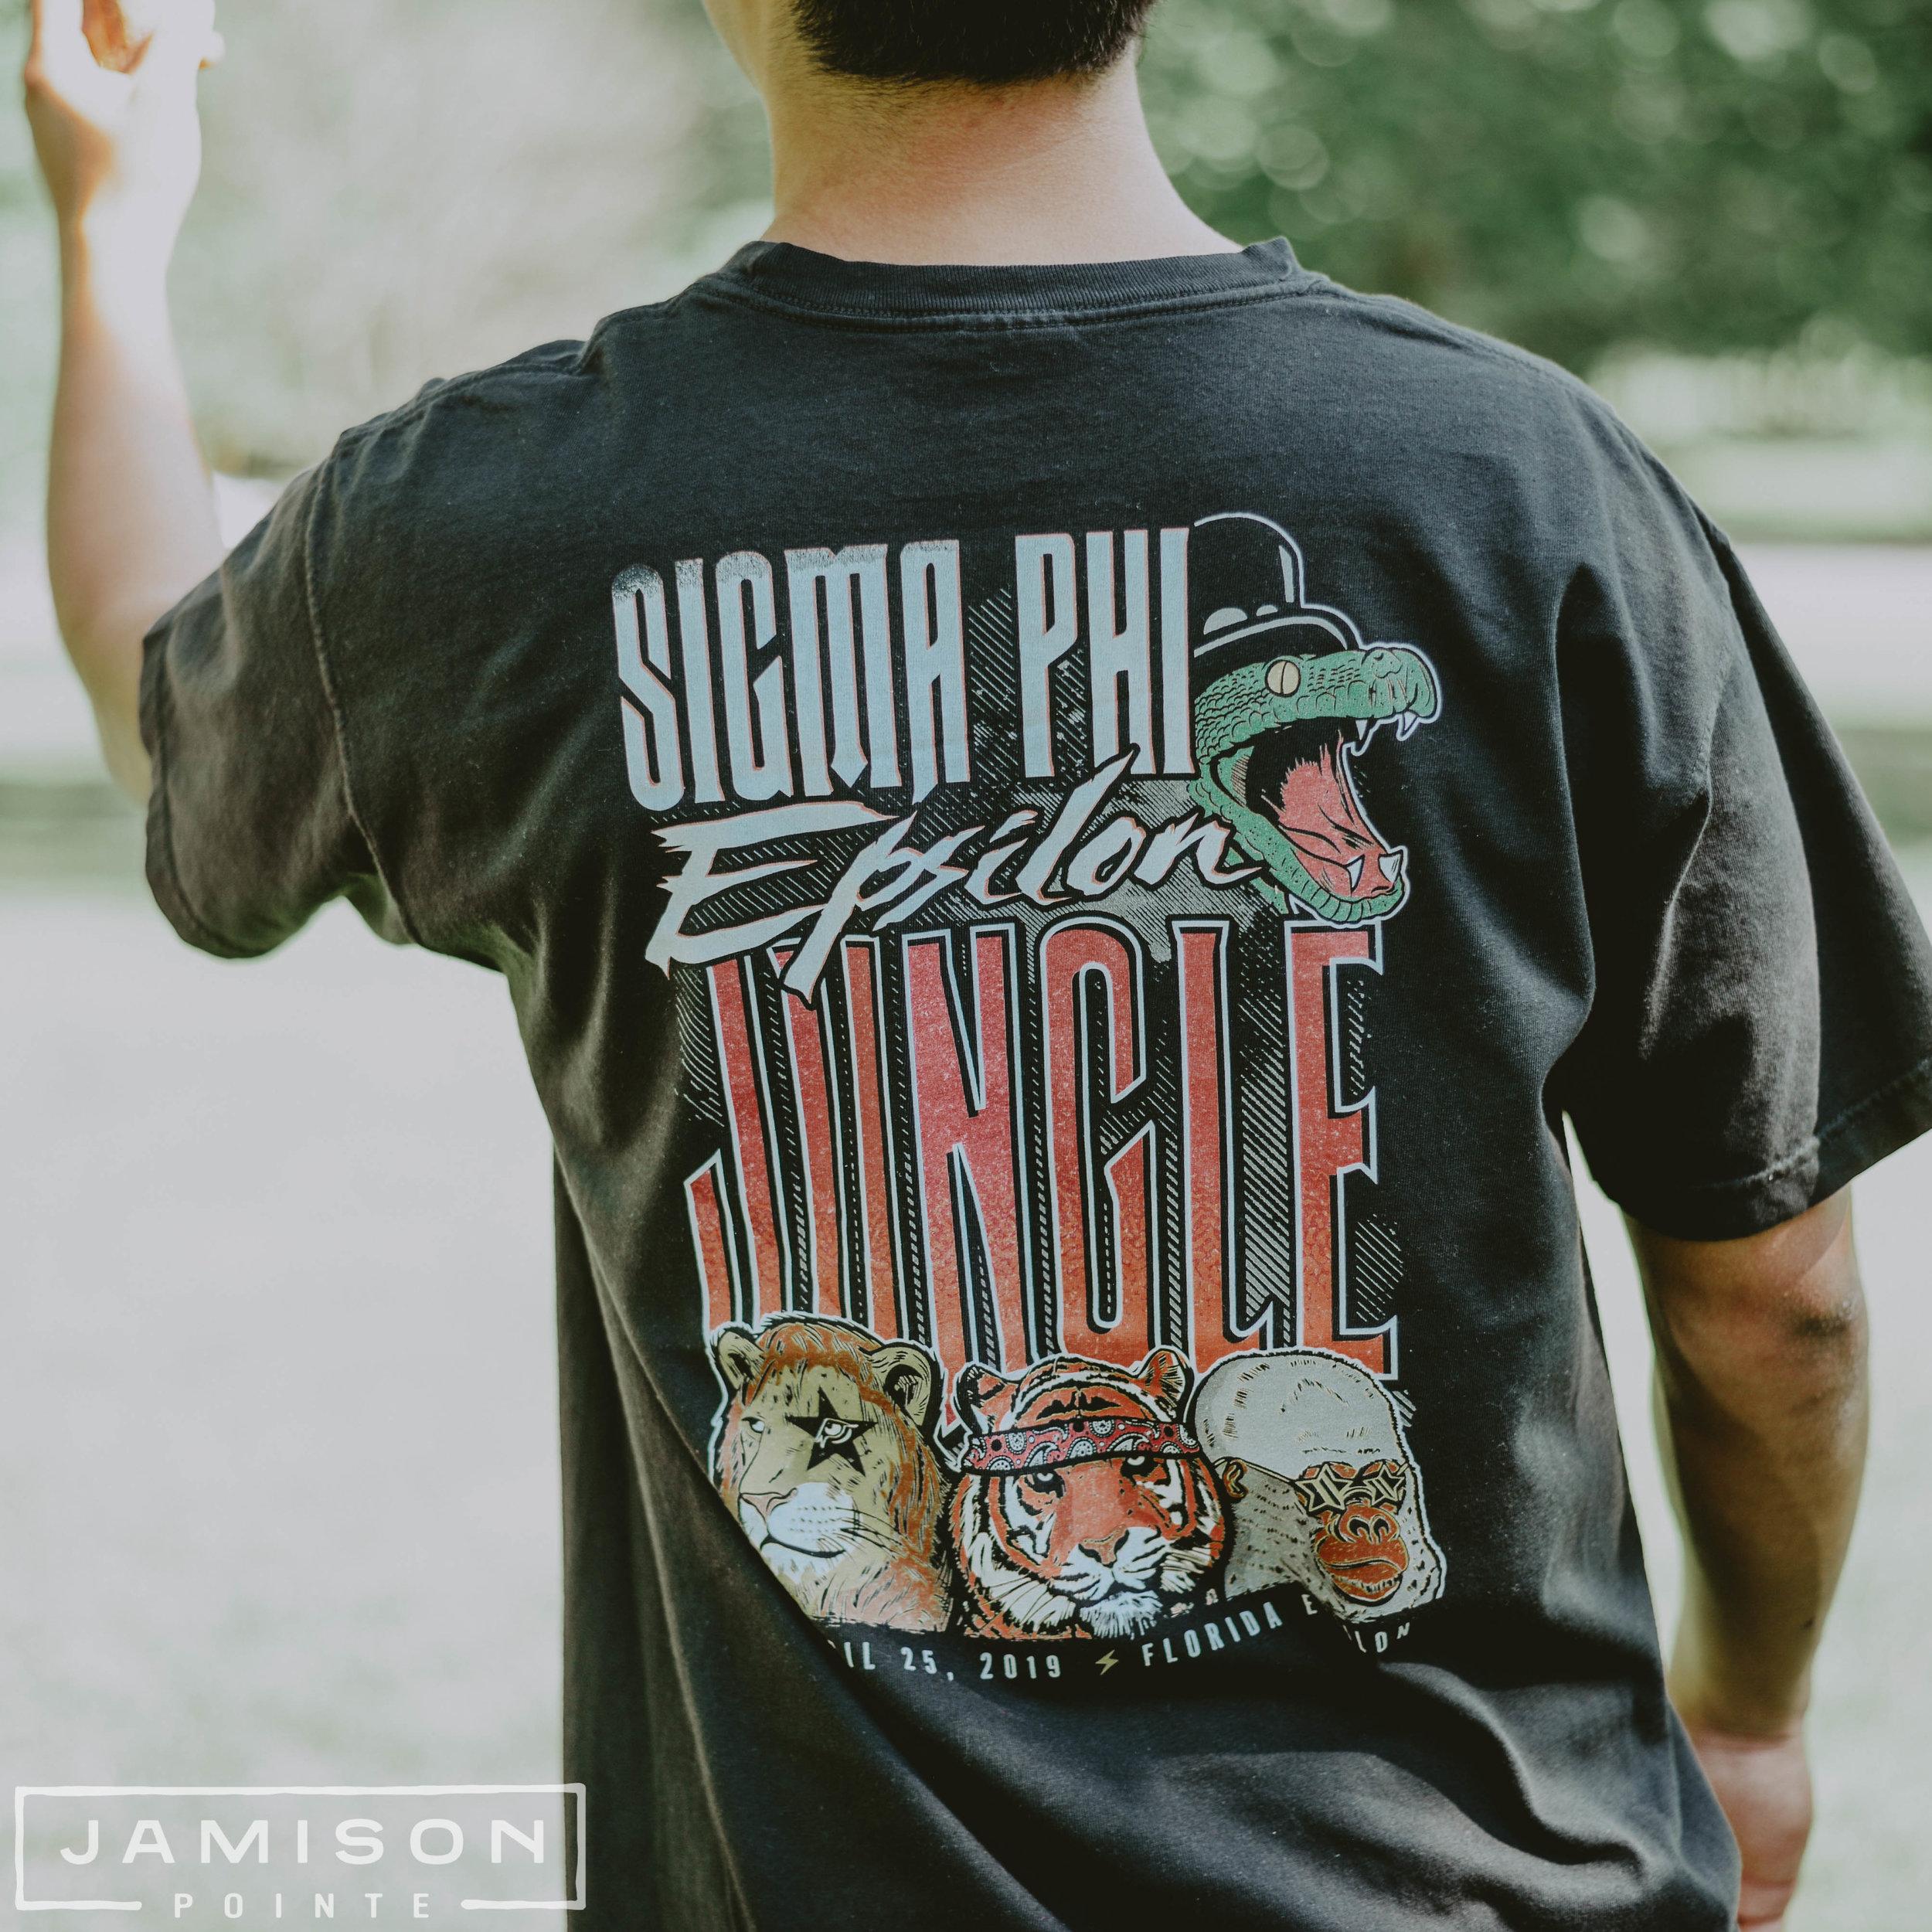 Sigma Phi Epsilon Jungle Tshirt